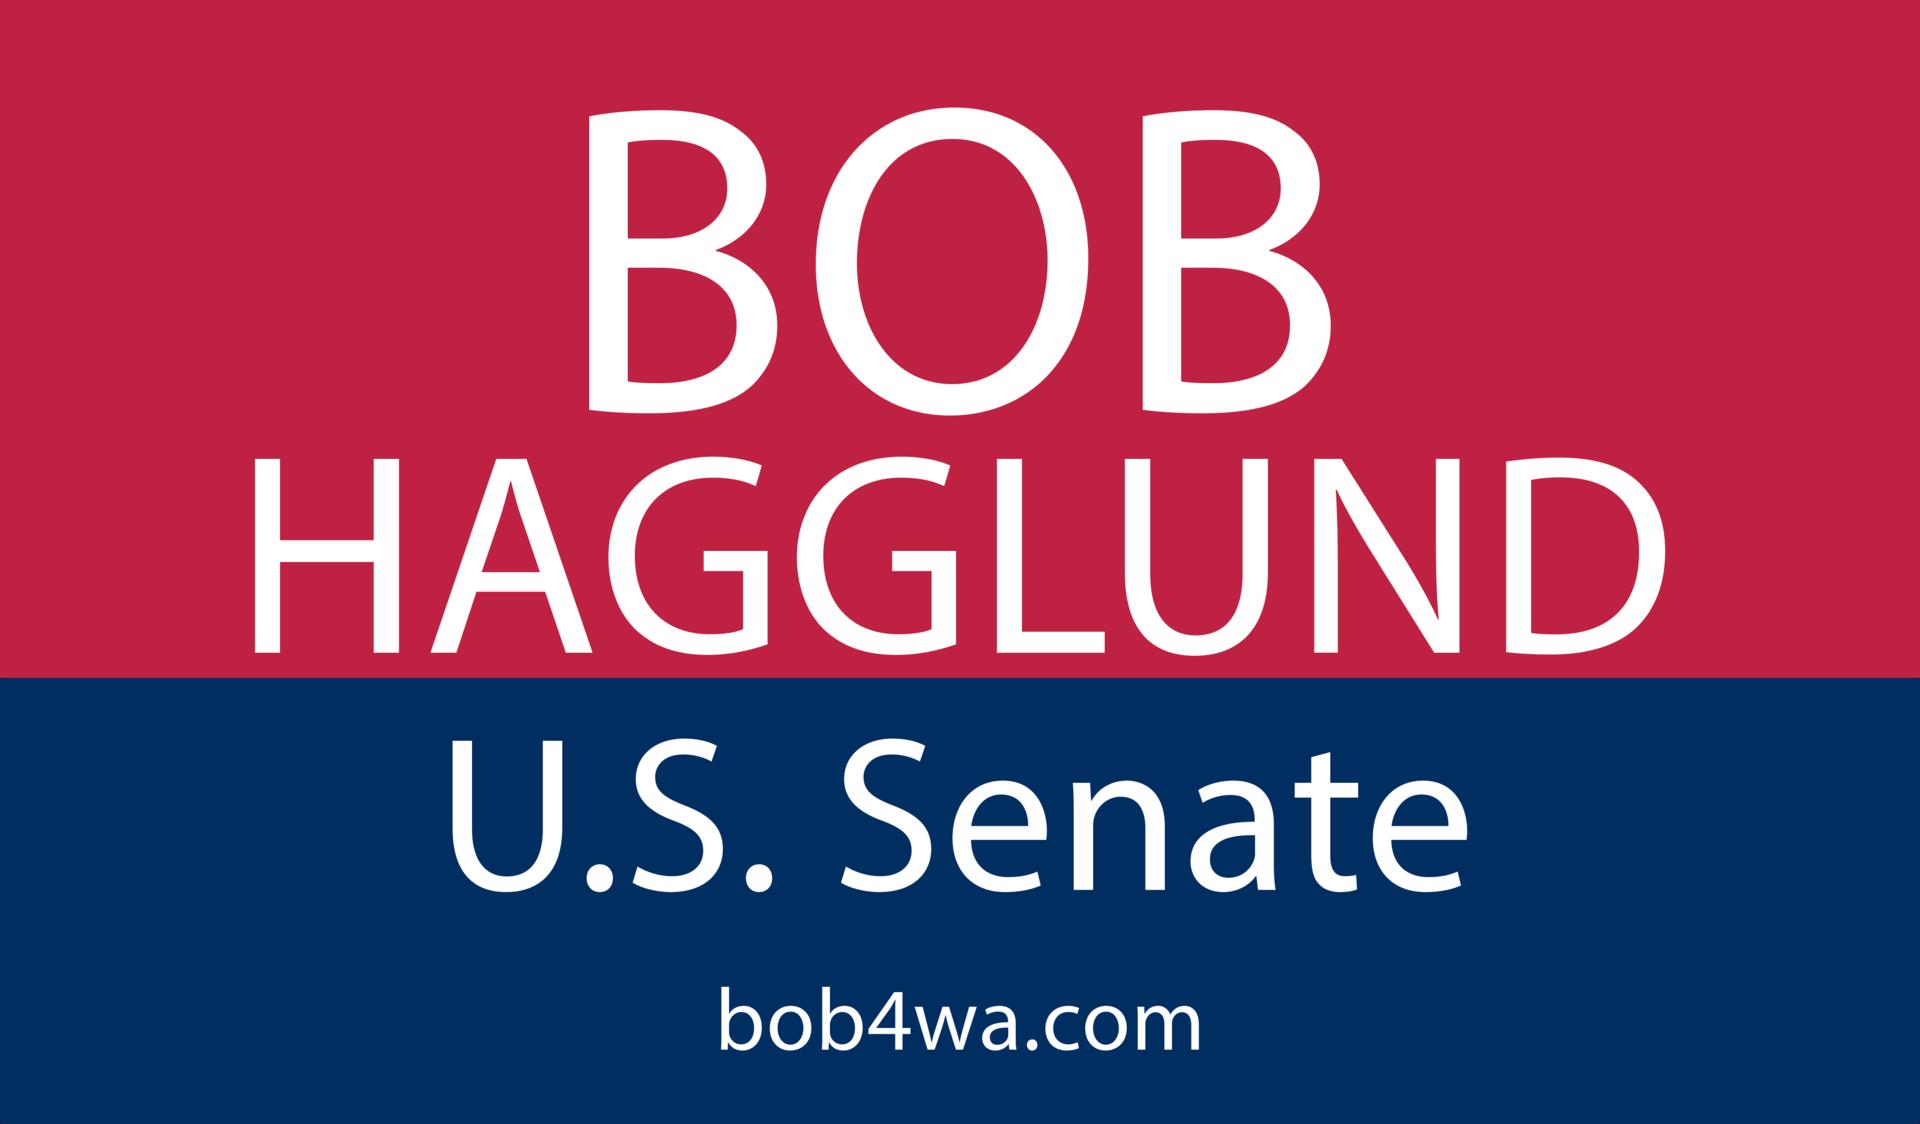 Bob hagglund u.s. senate 2022 business card front